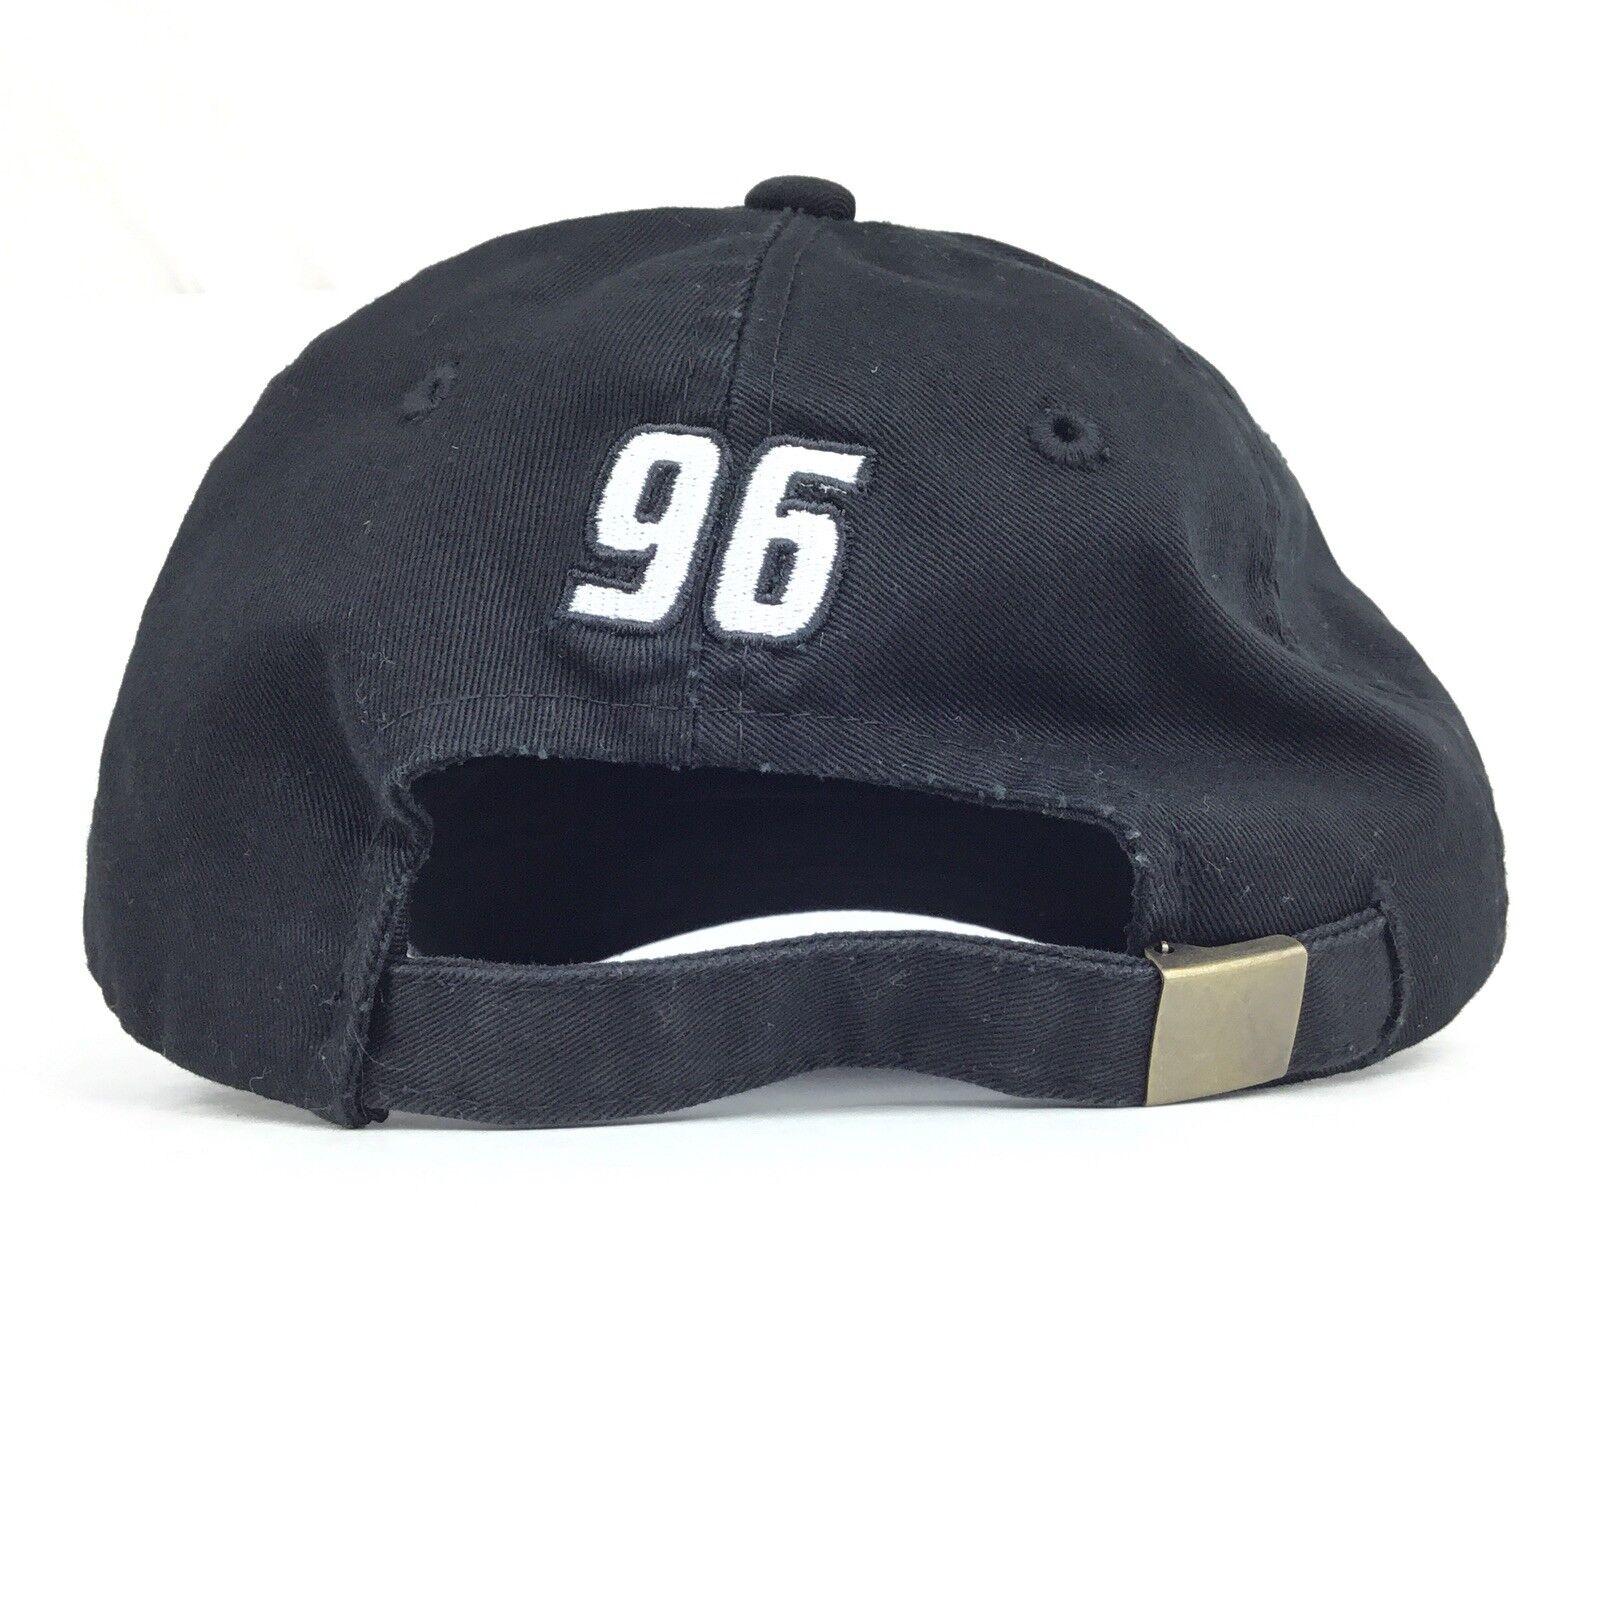 Texas 96 Instruments TI DLP HDTV 96 Texas Embroidered Black Baseball Cap Hat Adj Adult a527ee